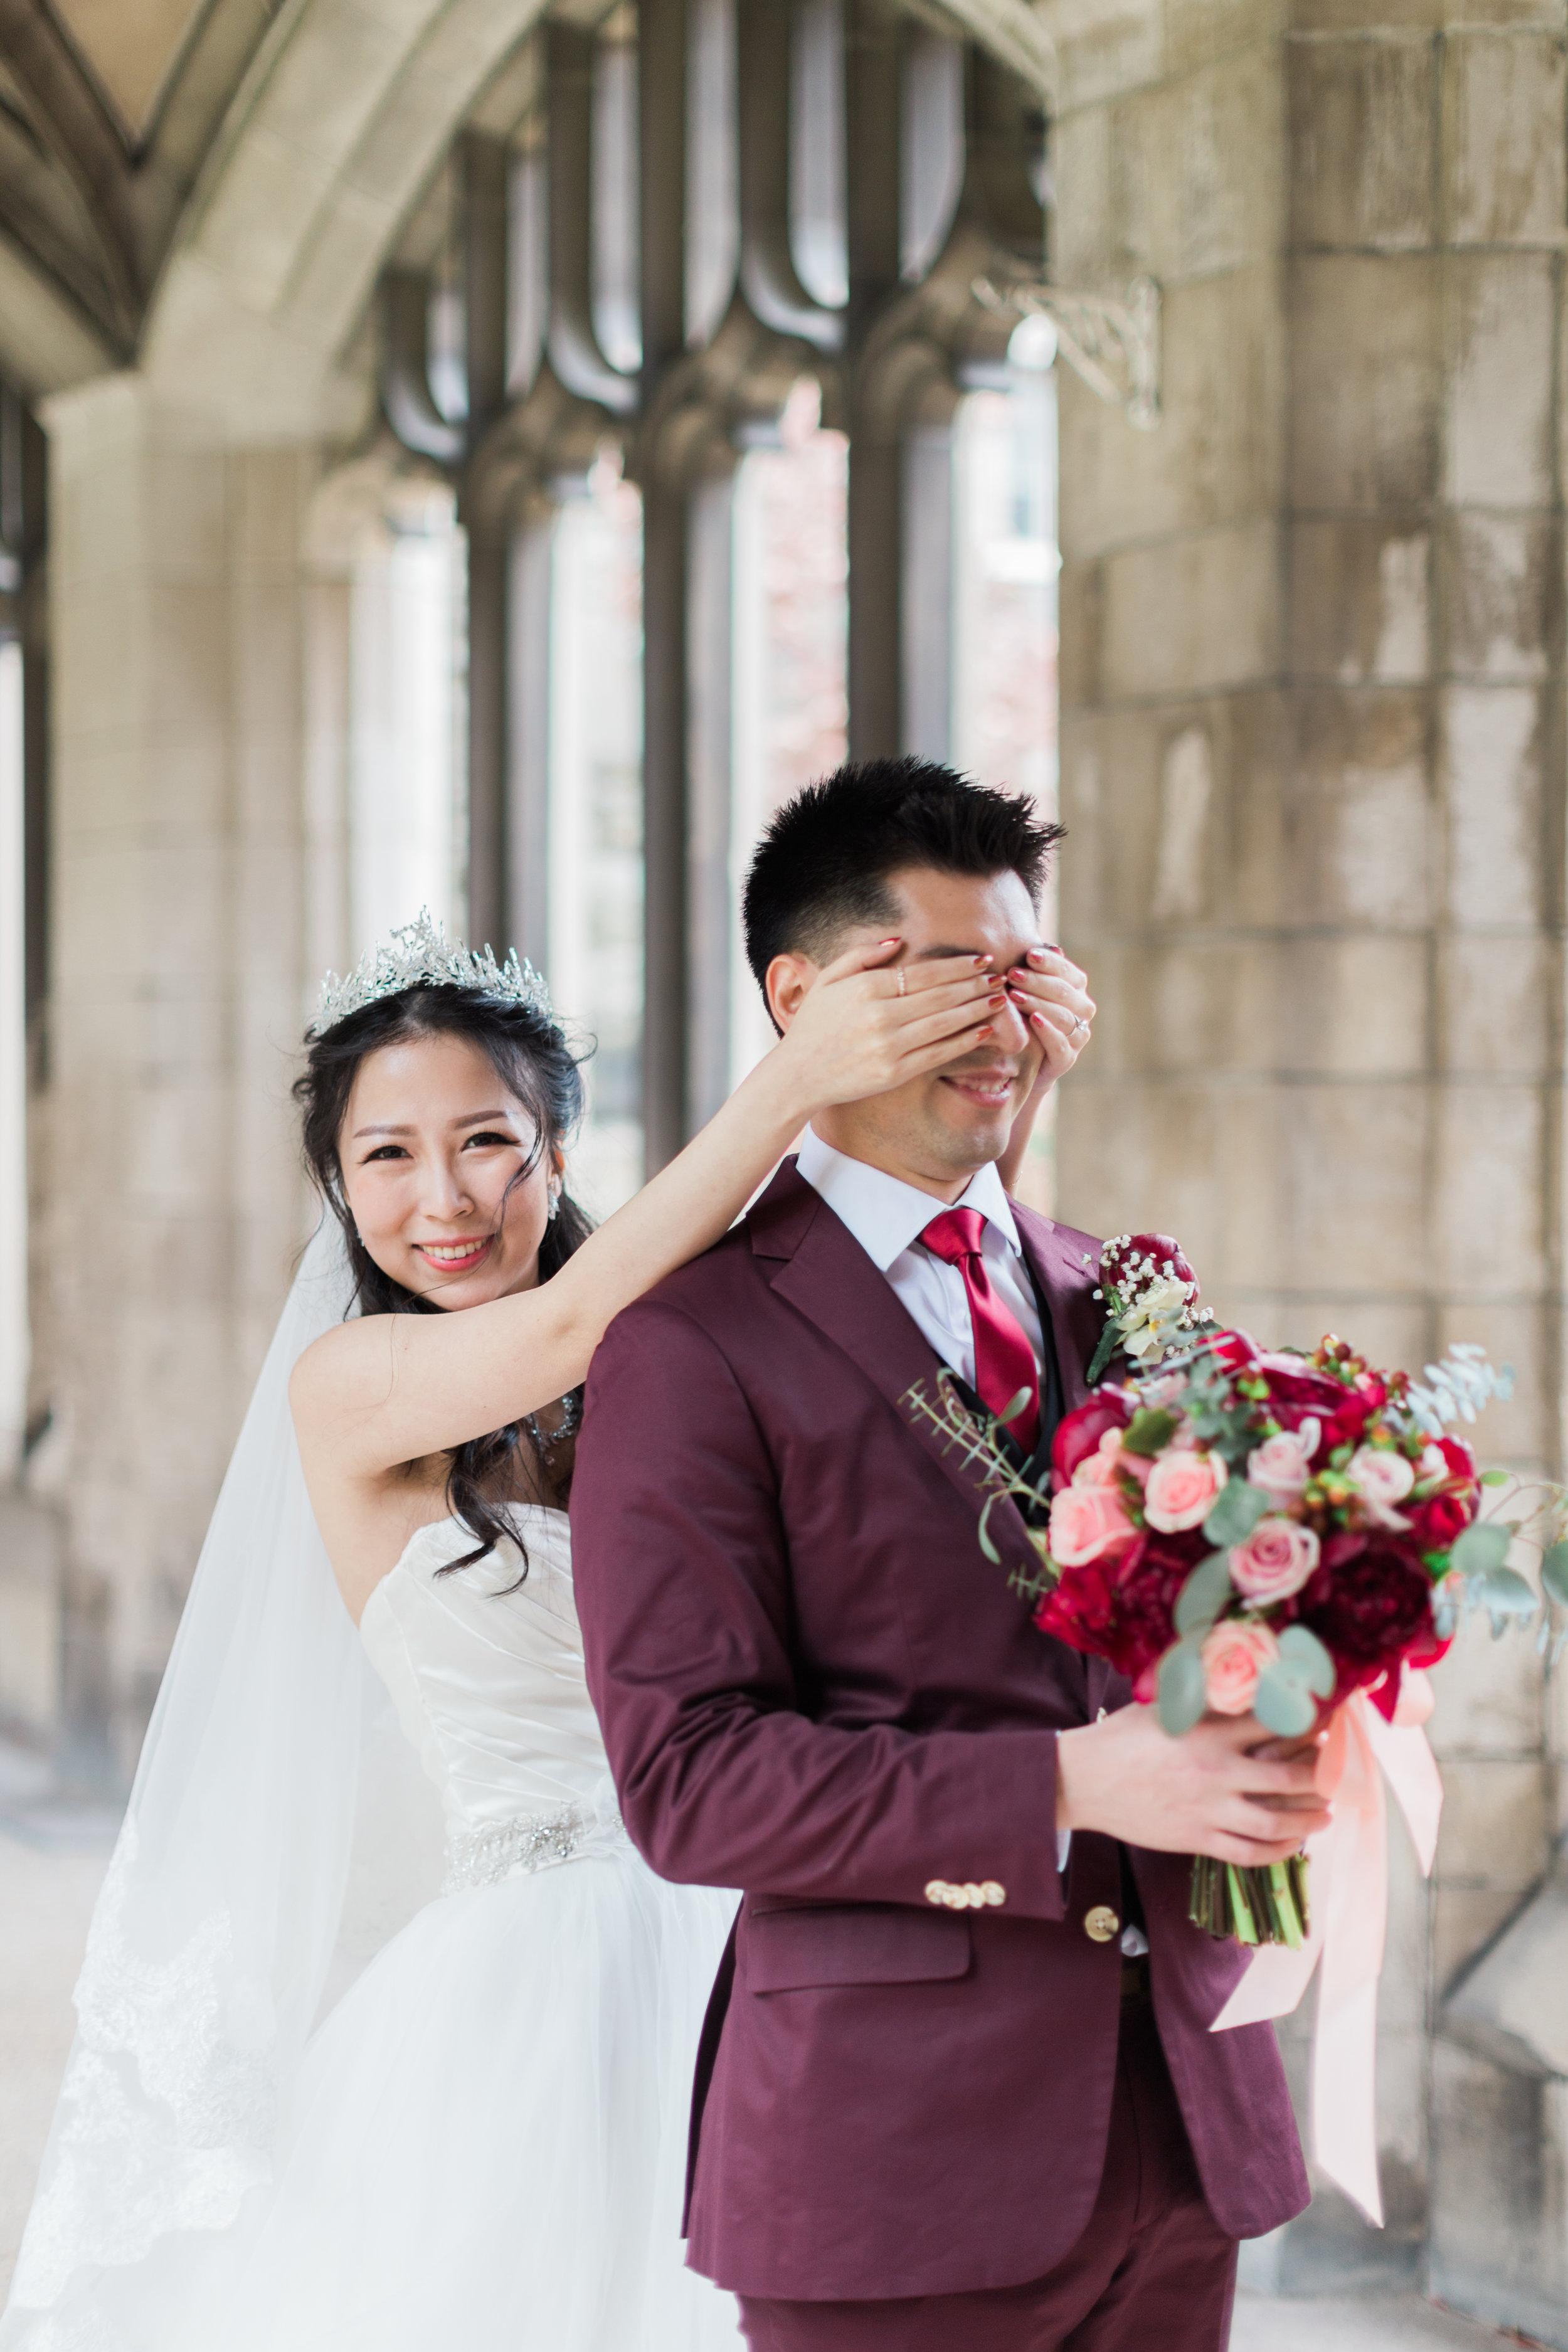 Parkview Manor Wedding - Bridal Portraits-15.jpg